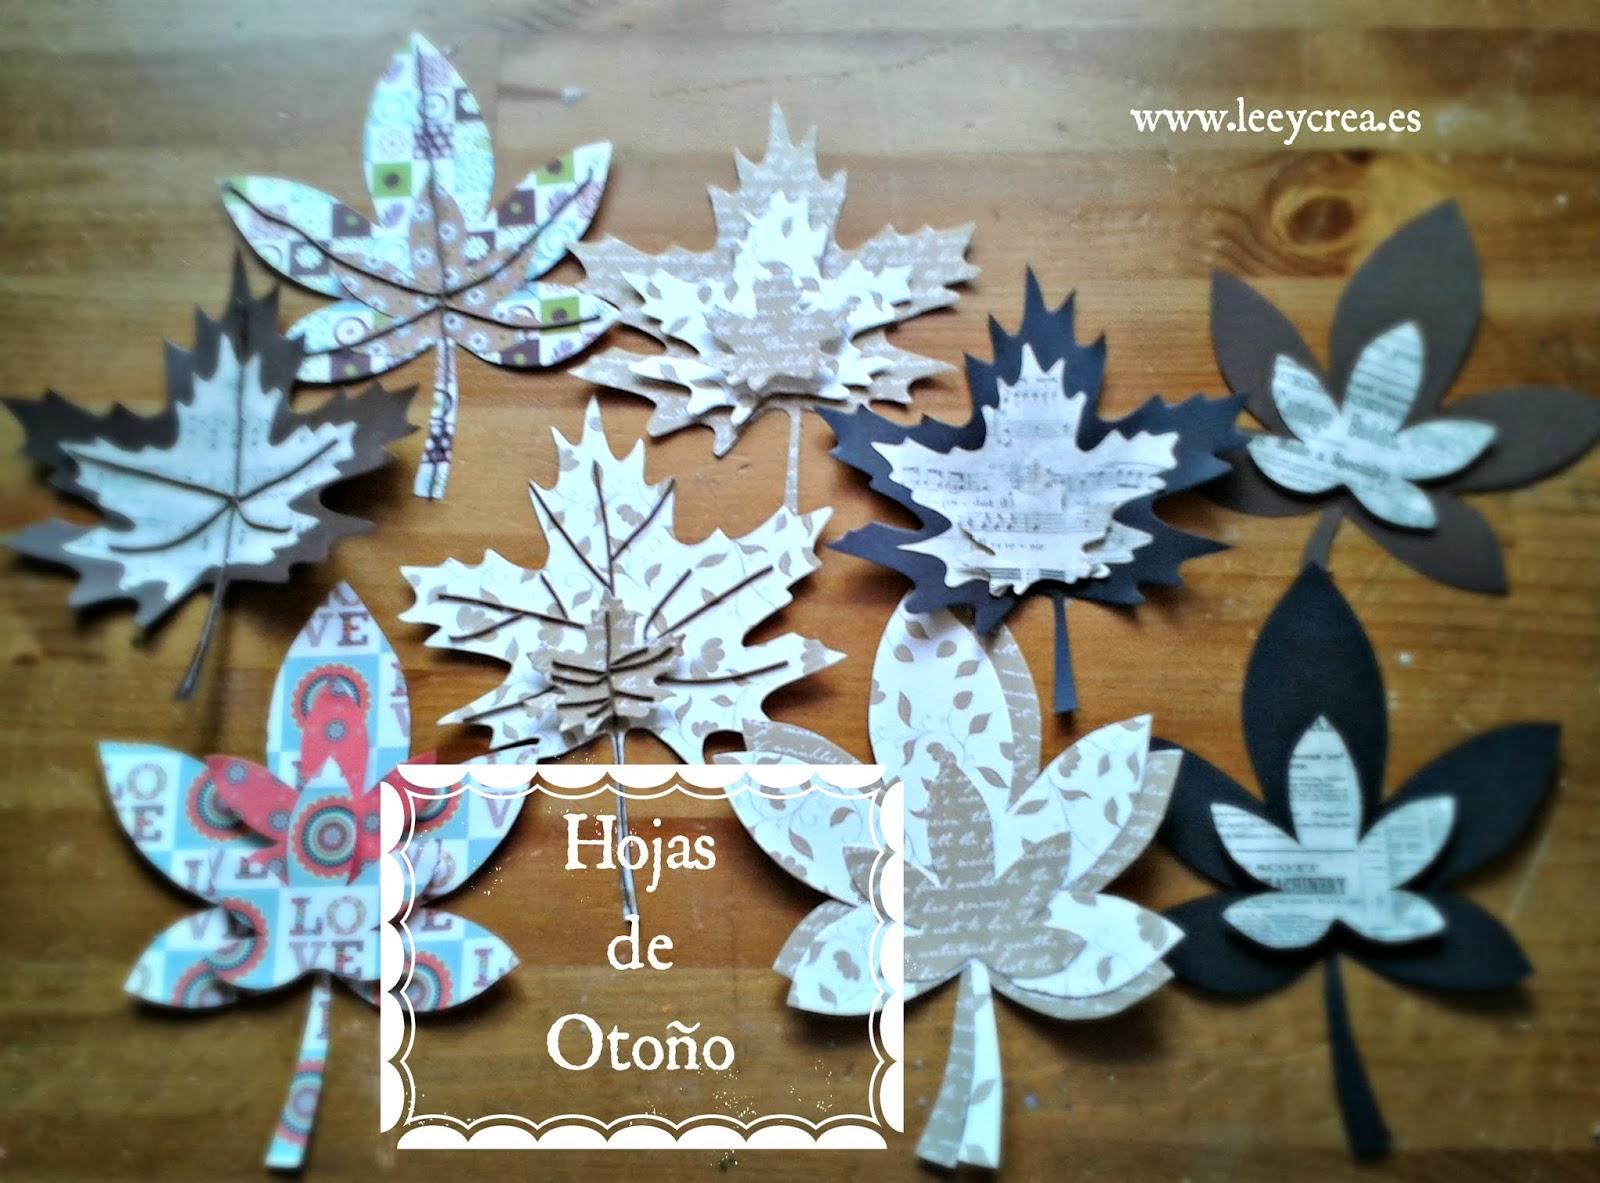 Hojas de oto o manualidades - Hojas de otono para decorar ...